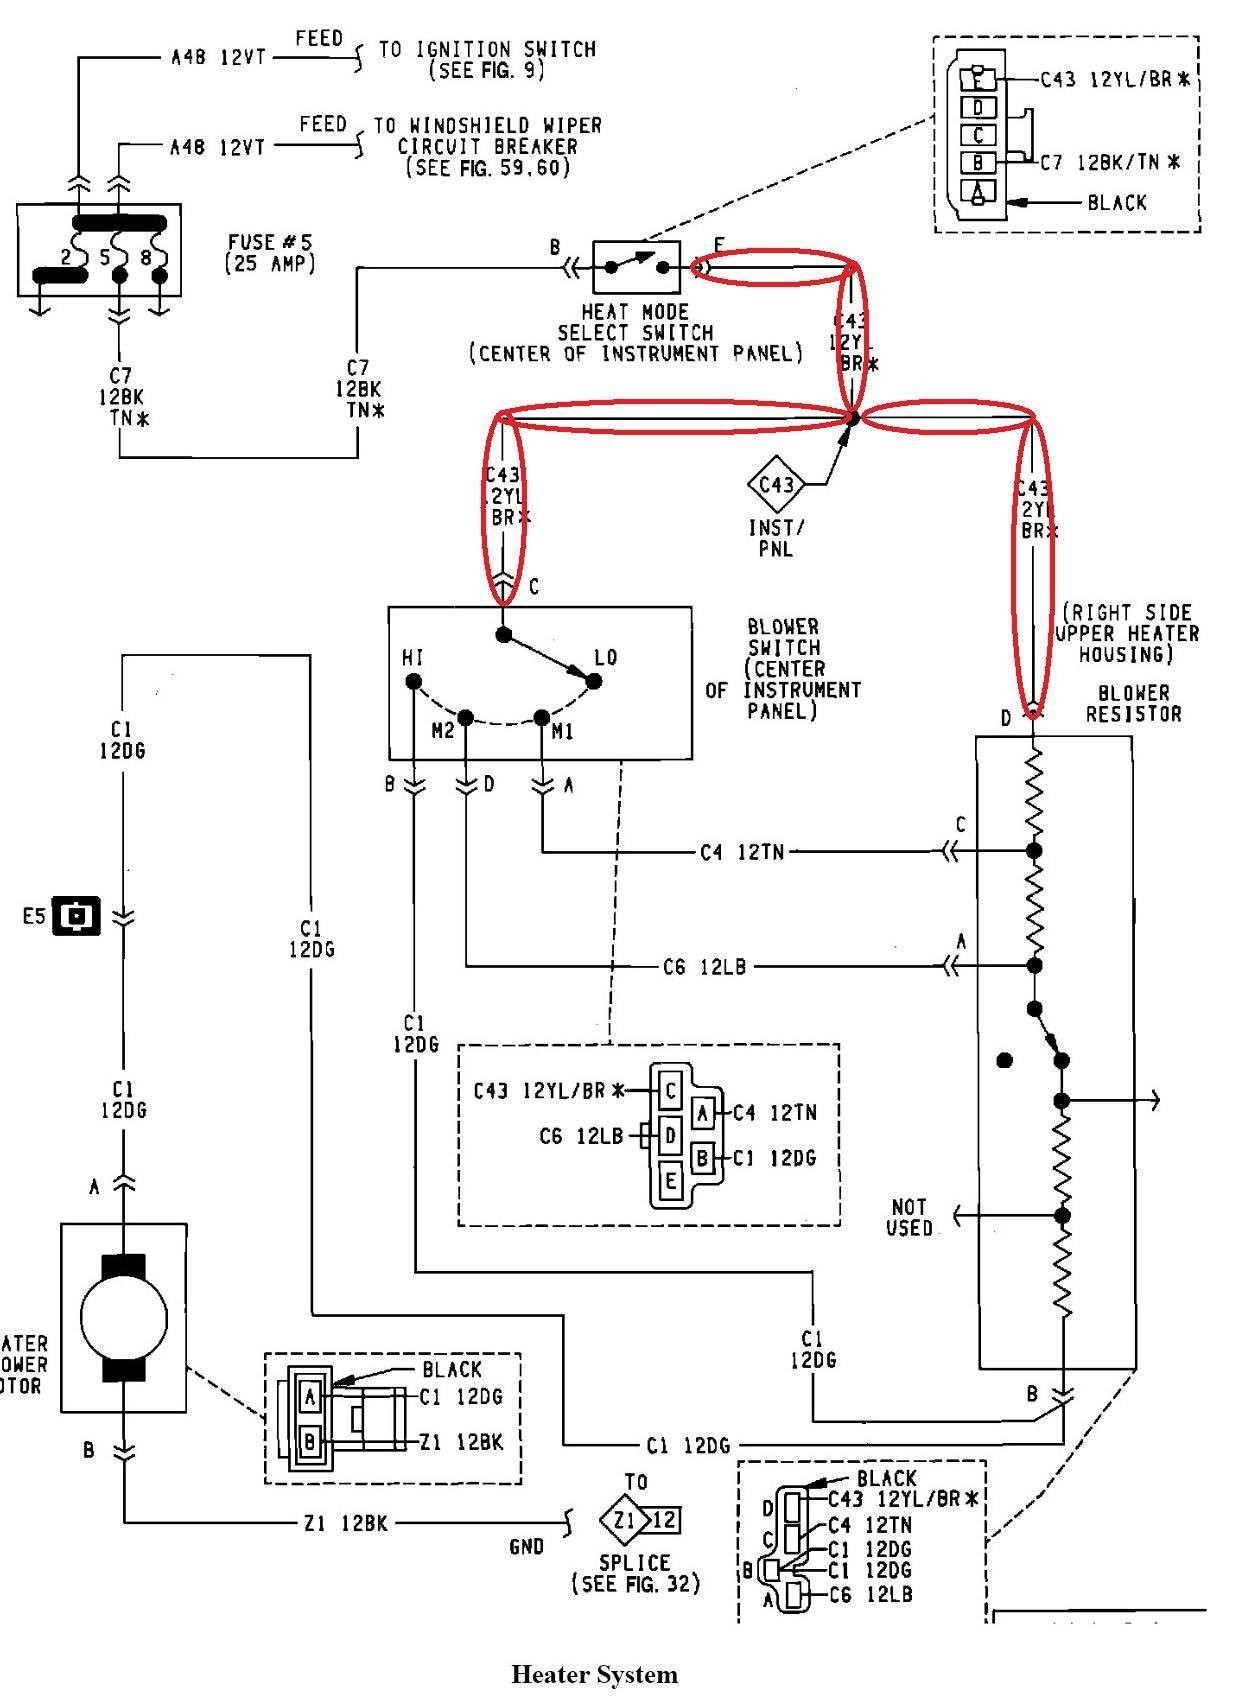 1998 Ez Go Wiring Diagram - Wiring Diagram